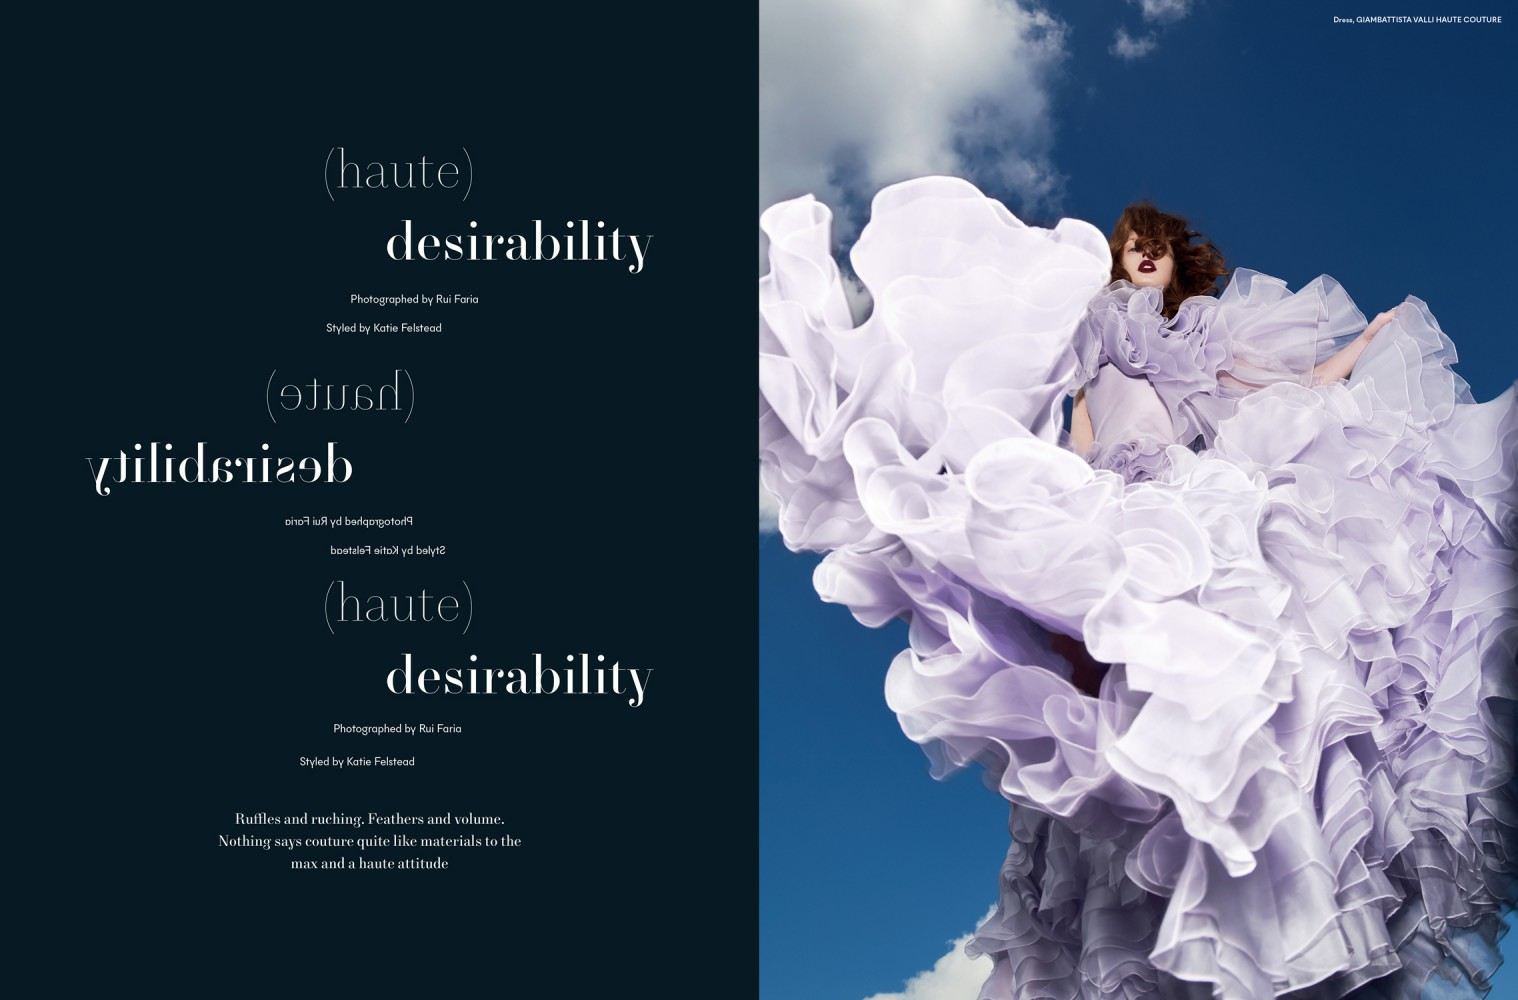 Haute-desirability-HR-2